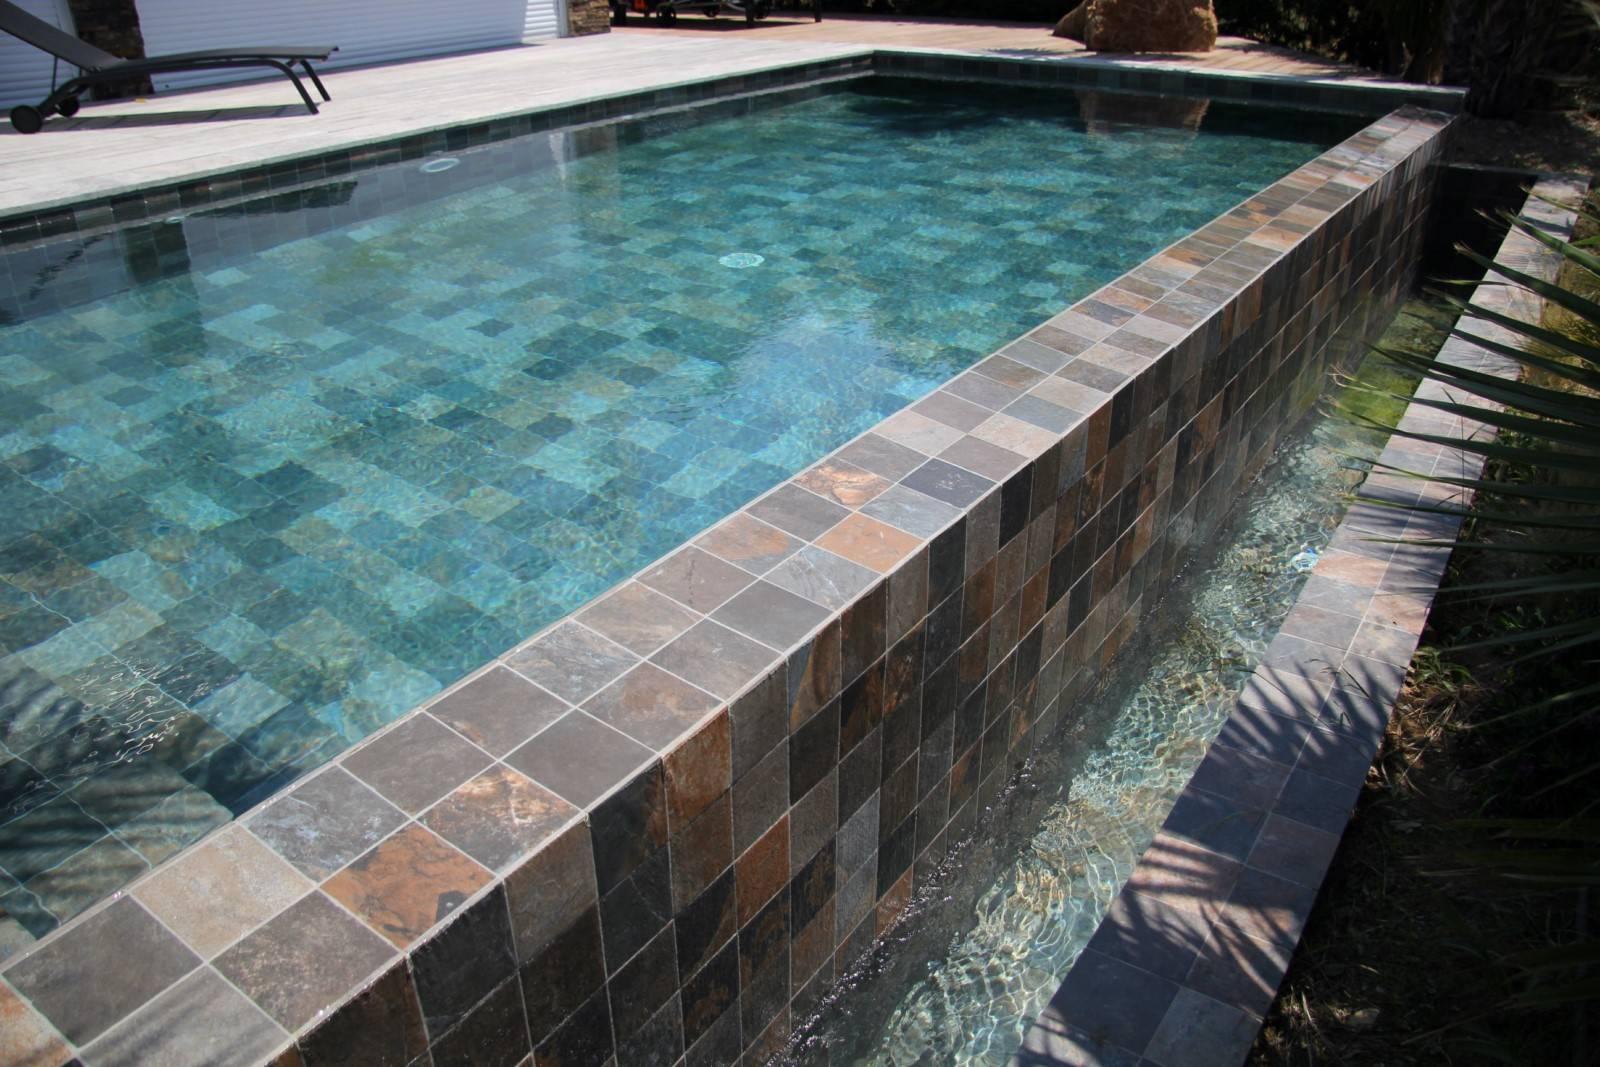 Carrelage Green Bali® 30X60 , Pour Un Bassin Avant Gardiste ... serapportantà Carrelage Piscine Bali 30X60